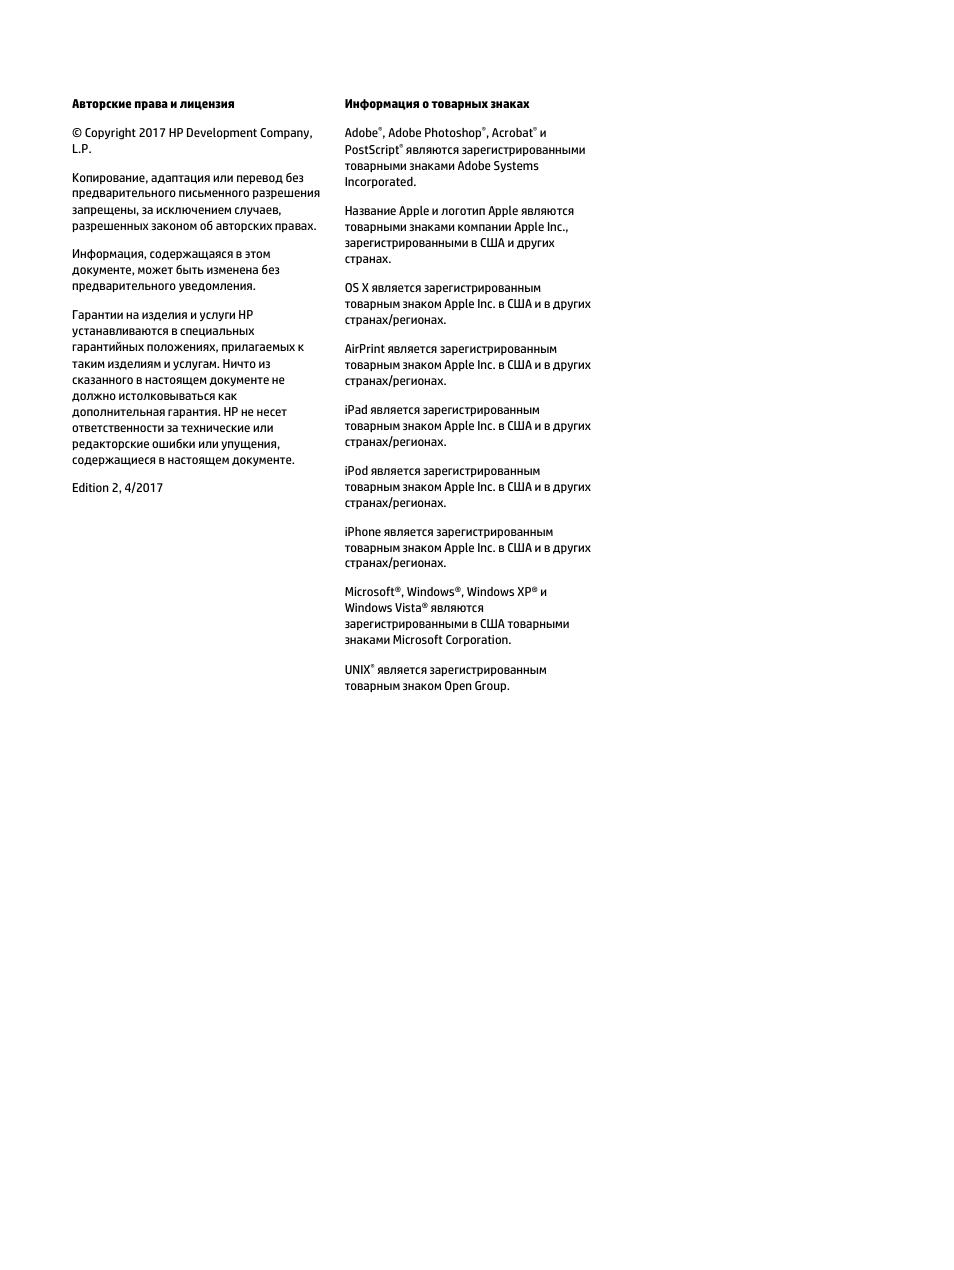 Инструкция по эксплуатации HP LaserJet Pro MFP M227fdw